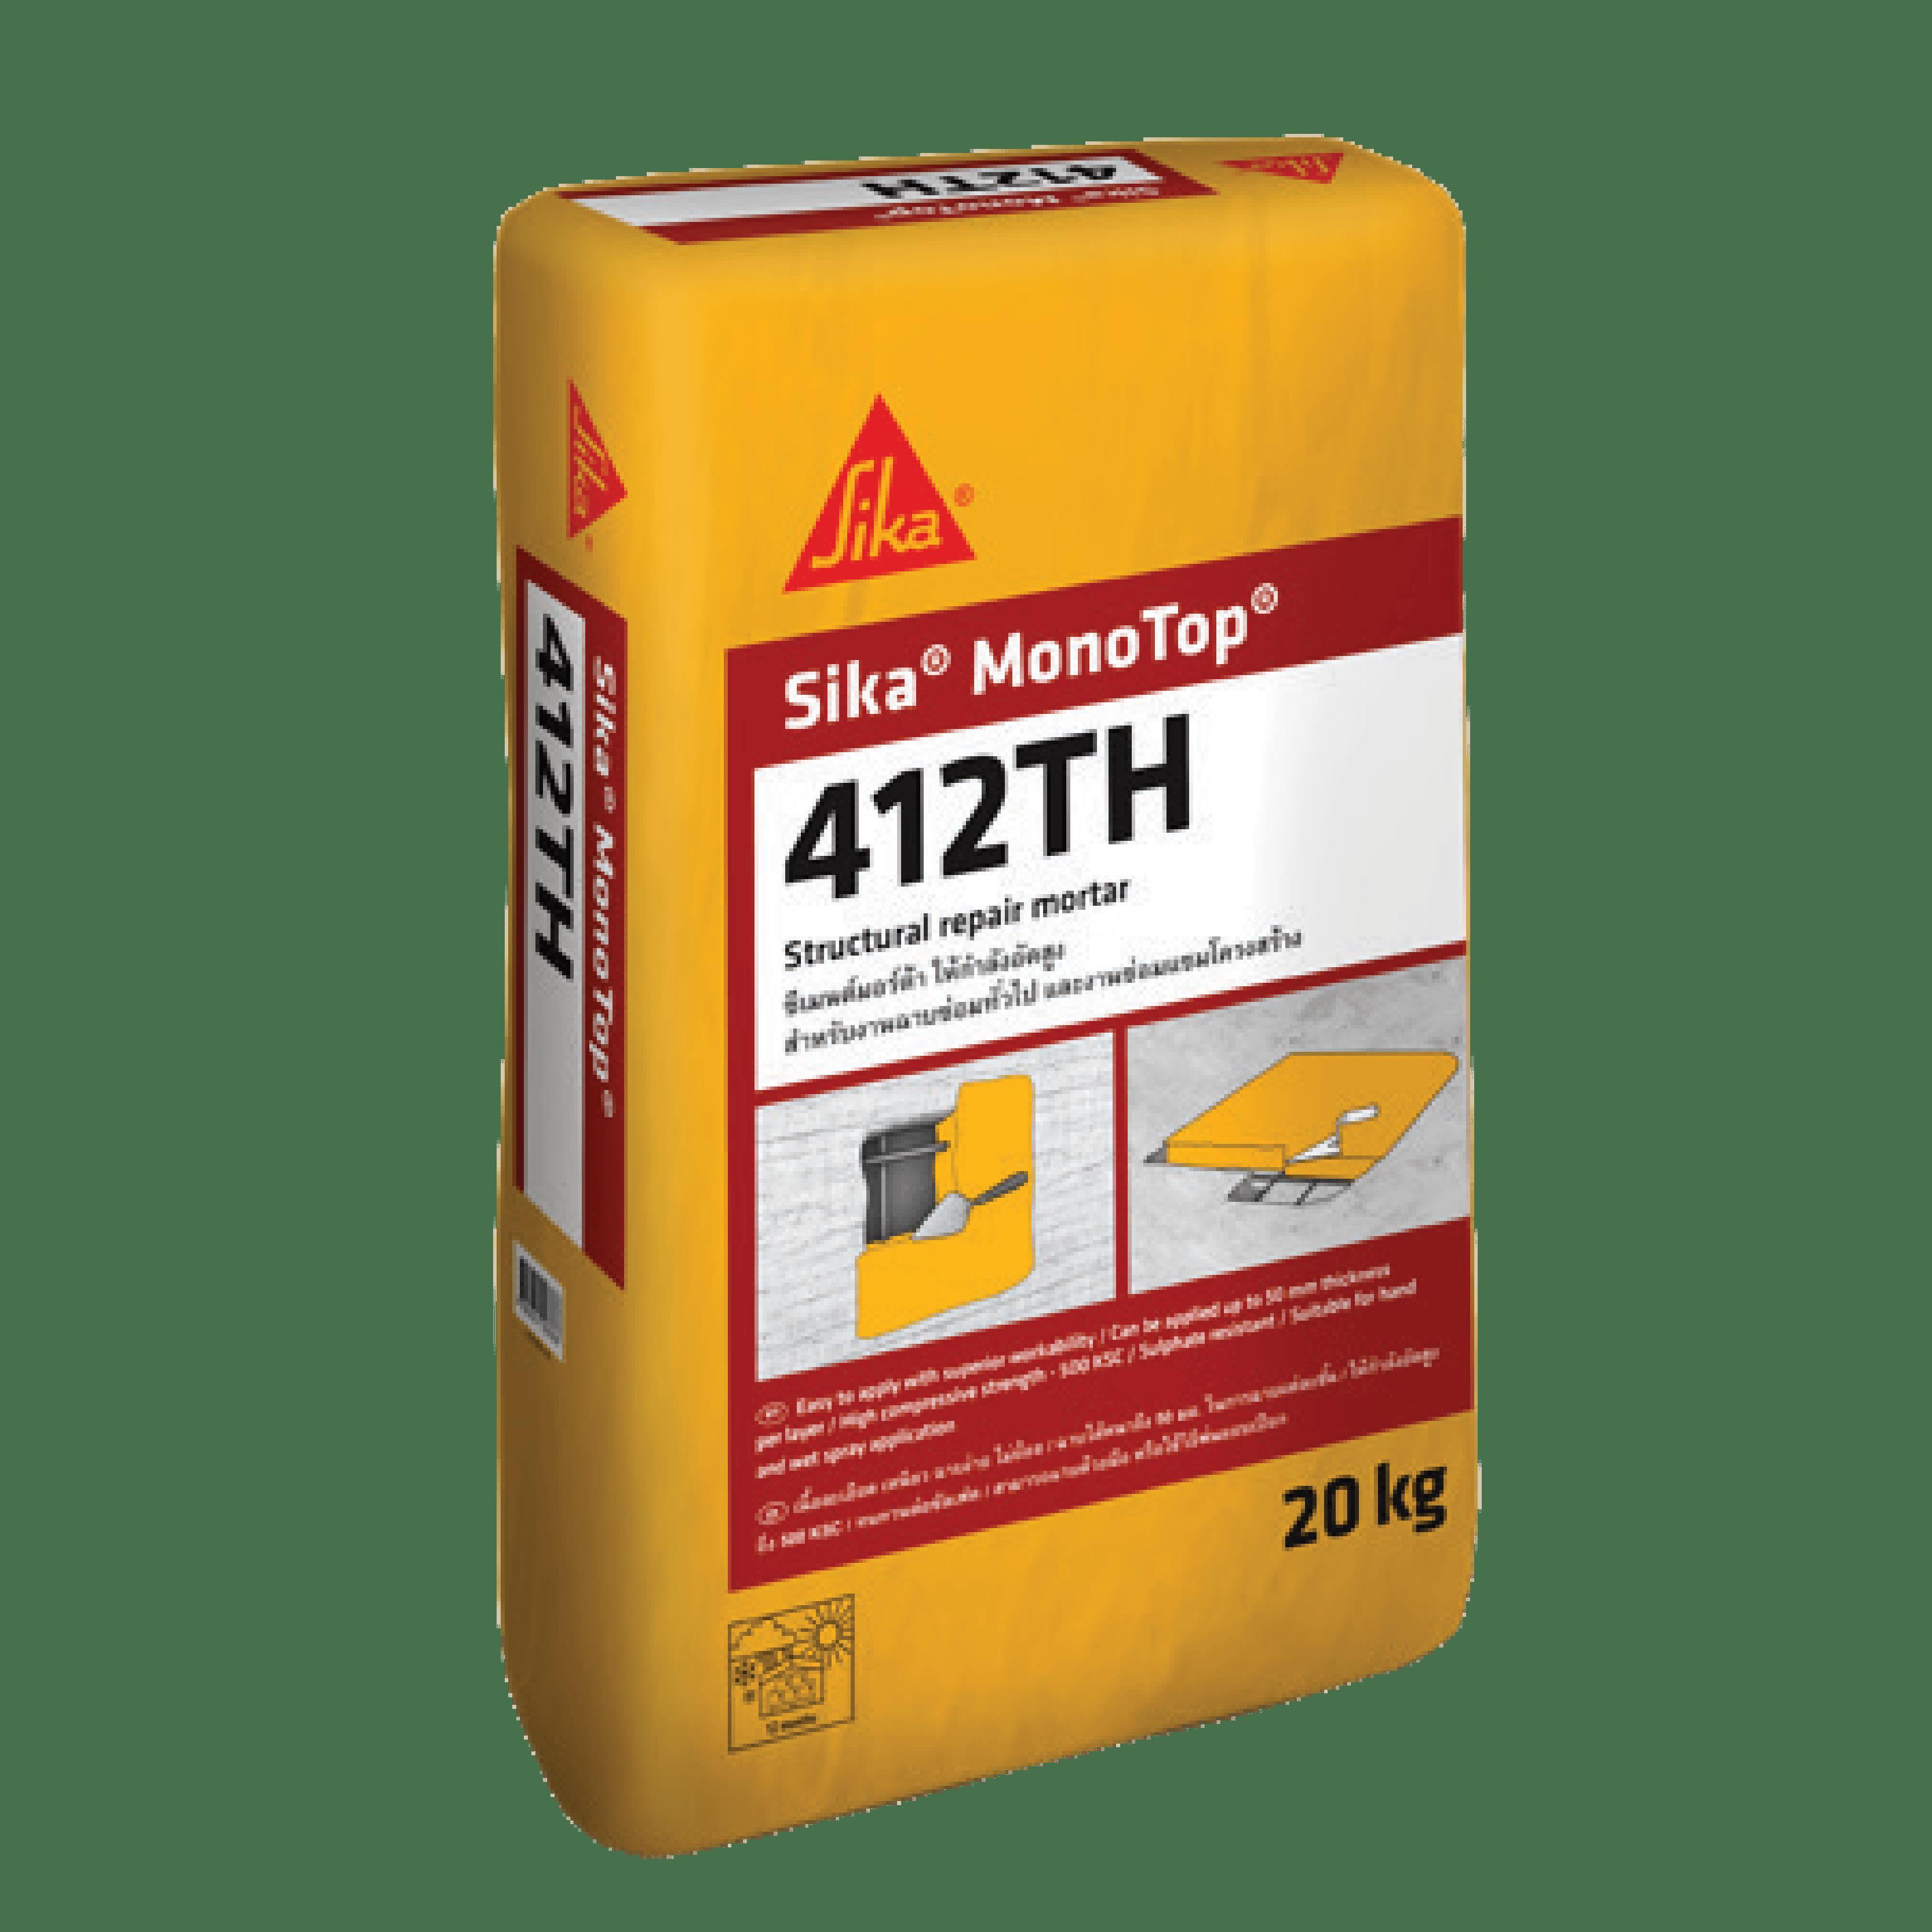 Sika® Monotop -412TH